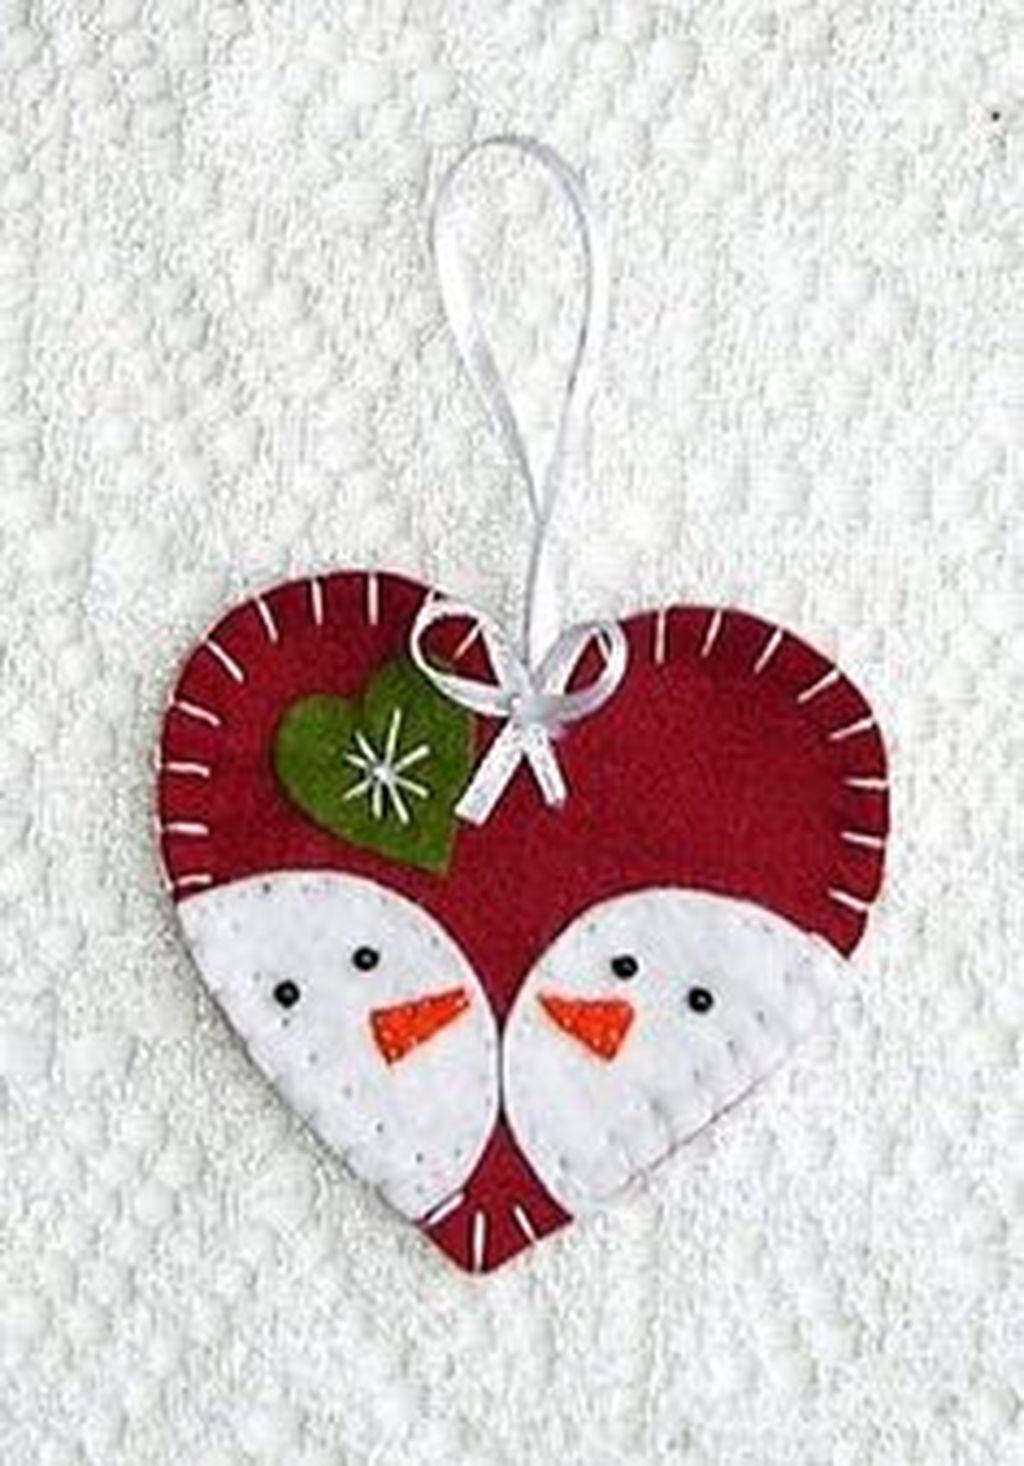 39 Brilliant Ideas How To Use Felt Ornaments For Christmas Tree Decoration 12